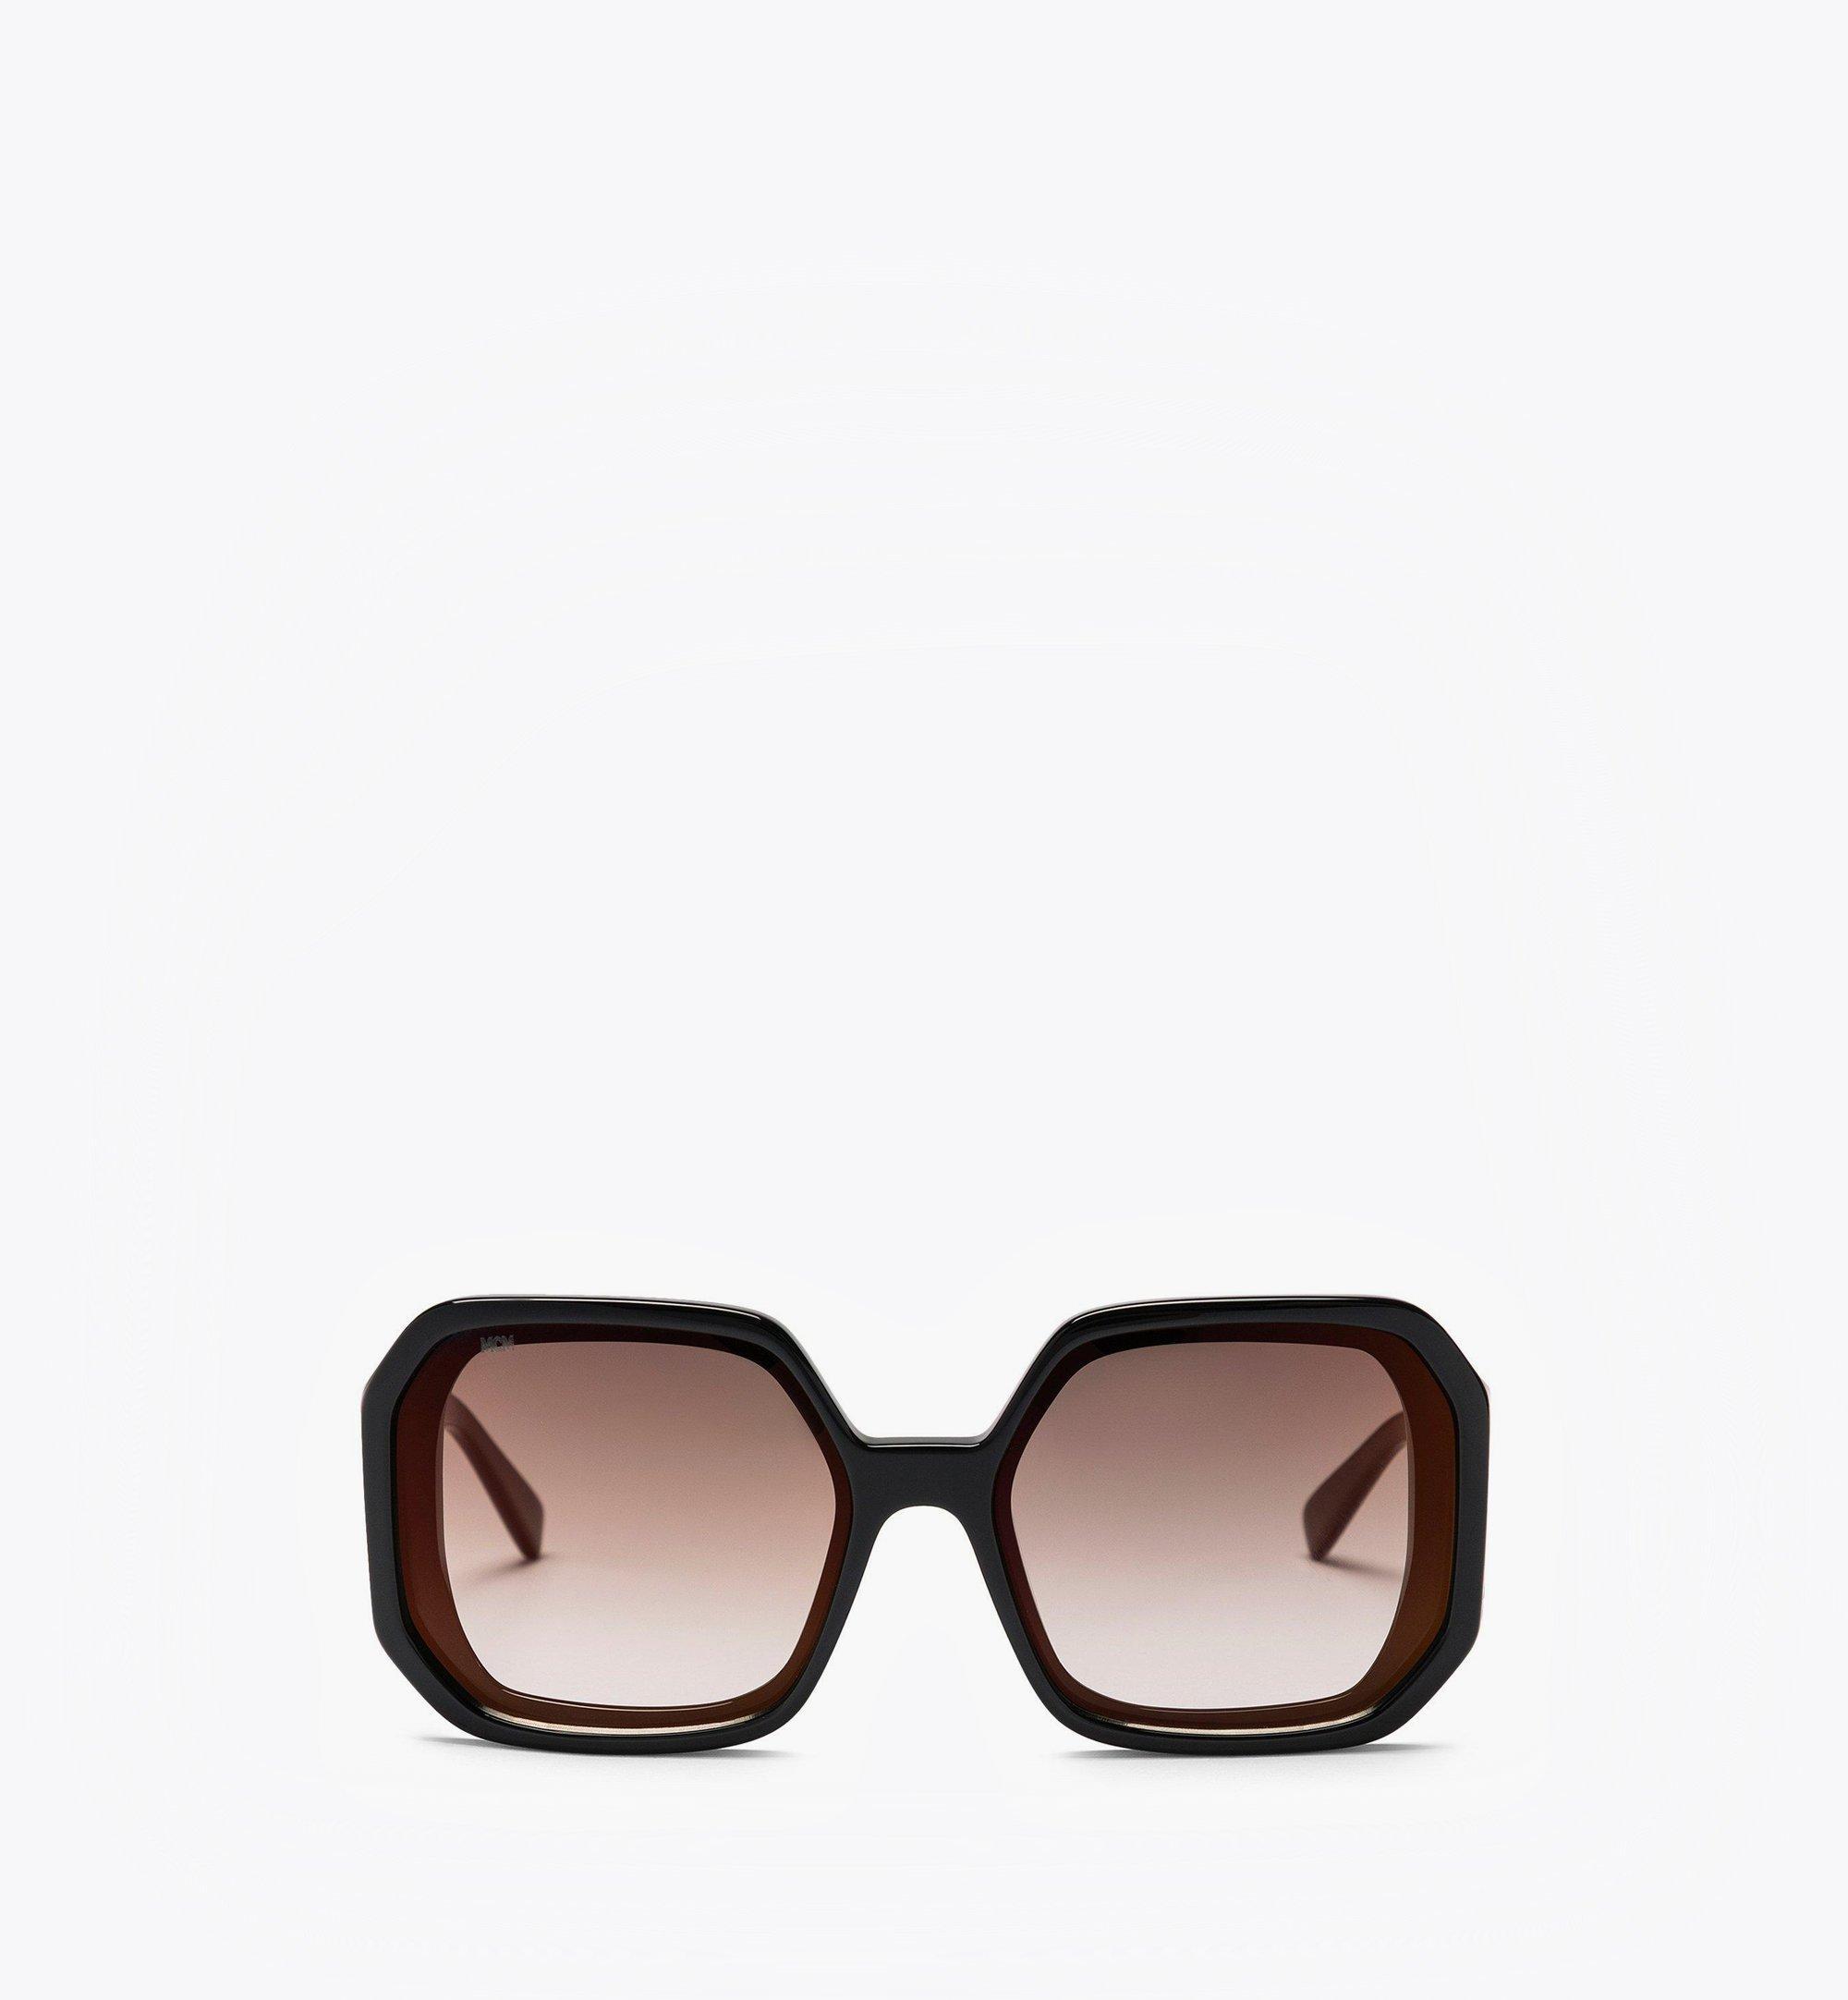 MCM MCM709S Geometric Sunglasses Black MEGBAMM05BK001 Alternate View 1